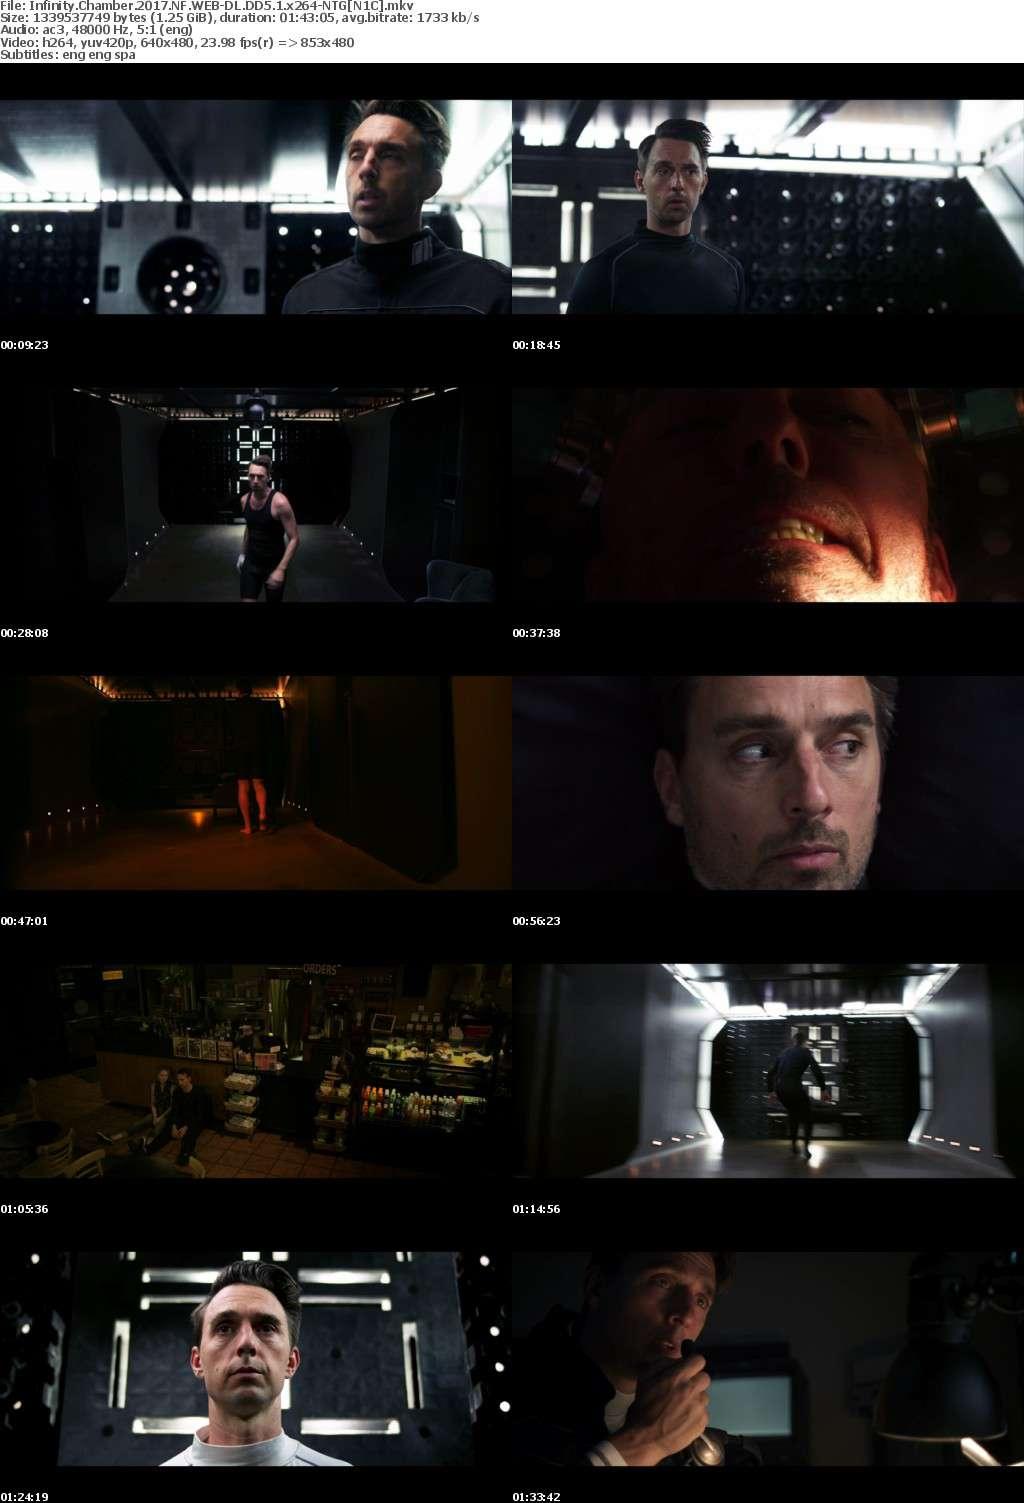 Infinity Chamber (2017) NF WEB-DL DD5.1 x264-NTG